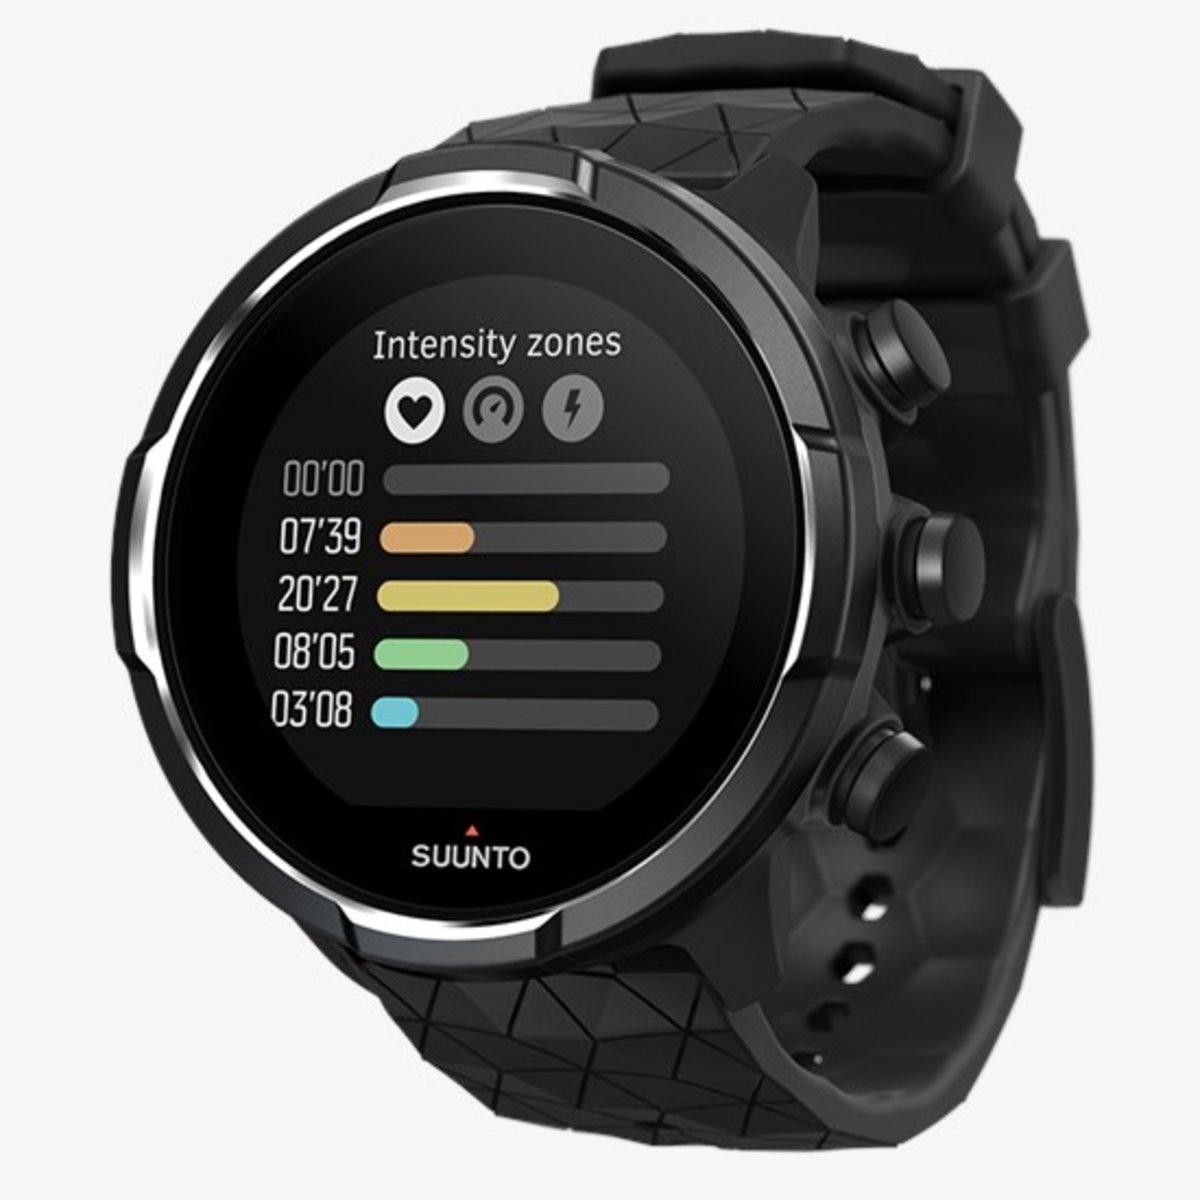 9 Baro Titanium 全方位運動智能手錶[SS050149000]